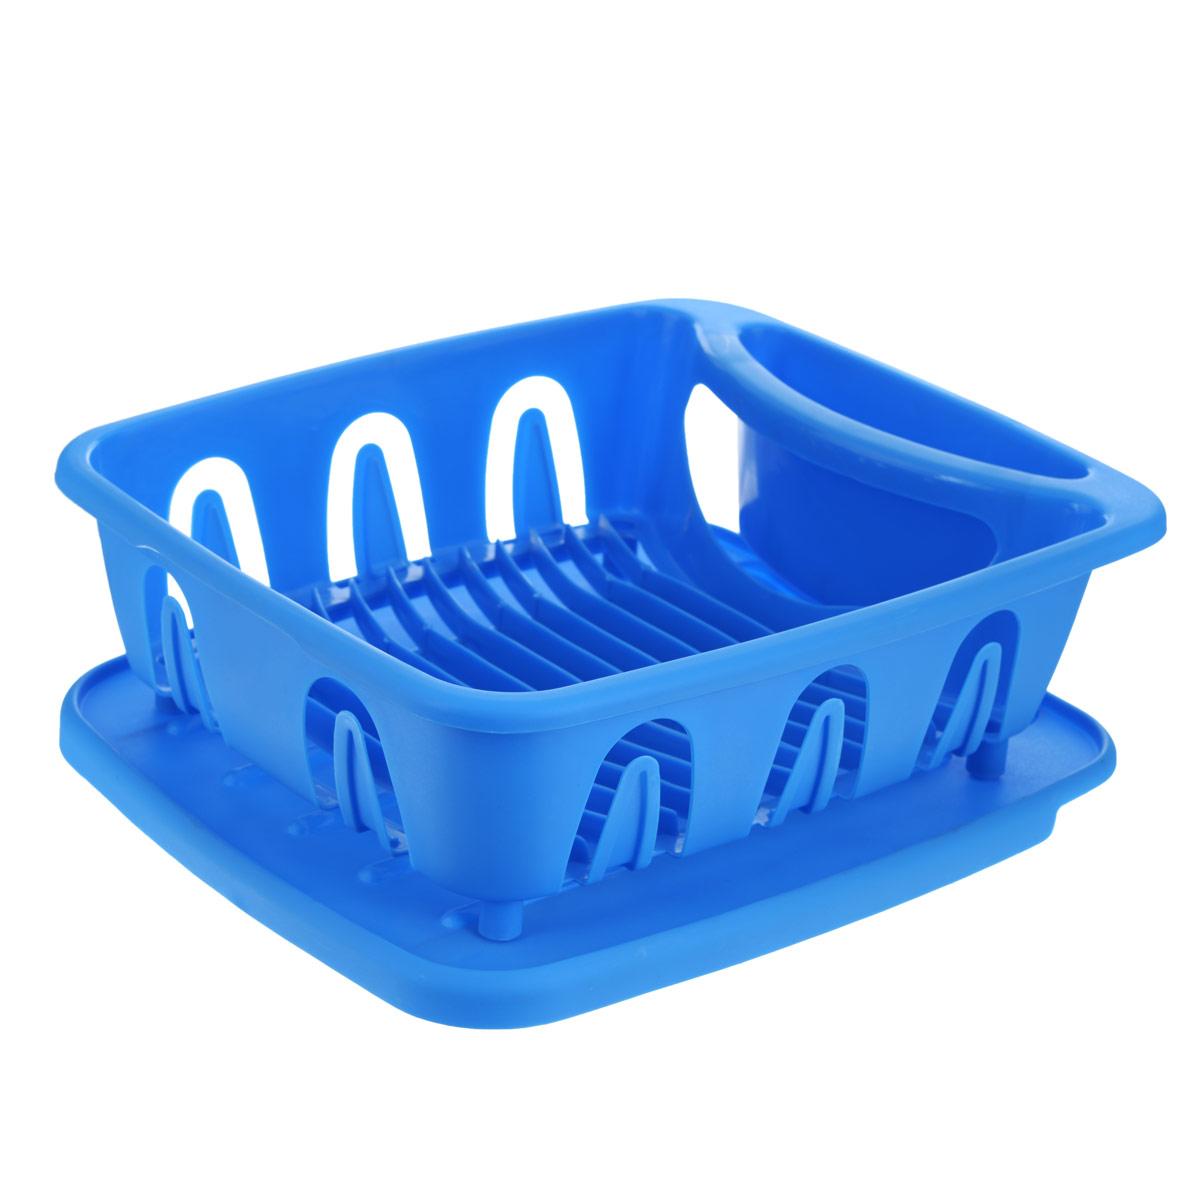 Подставка для посуды Oriental Way, цвет: голубой, 36 см х 31 см х 13 см